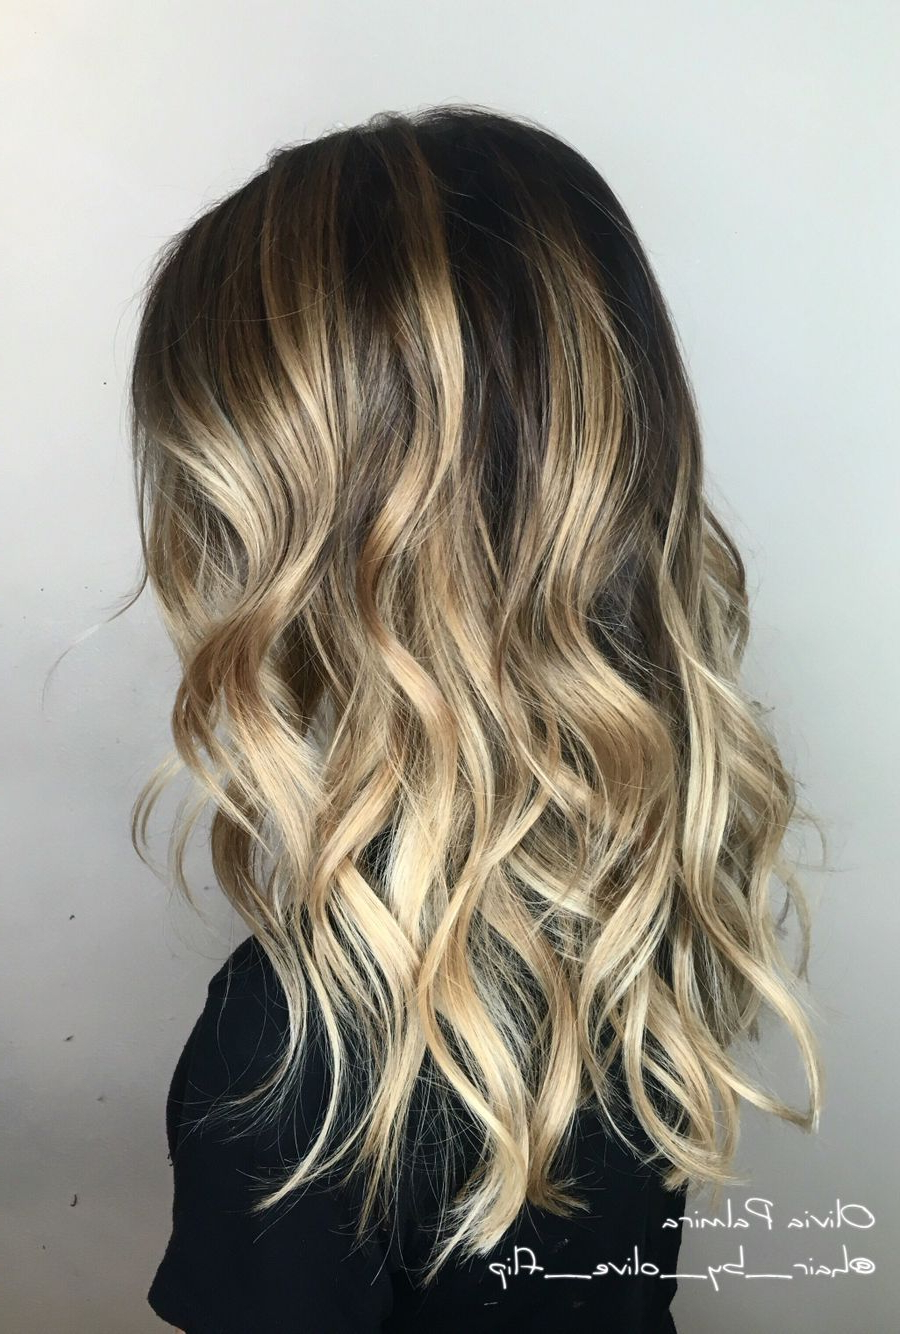 Aveda Wavy Long Hair Blonde Bob Short Hair Beach Wave Medium Intended For Trendy Mid Length Beach Waves Hairstyles (View 7 of 20)